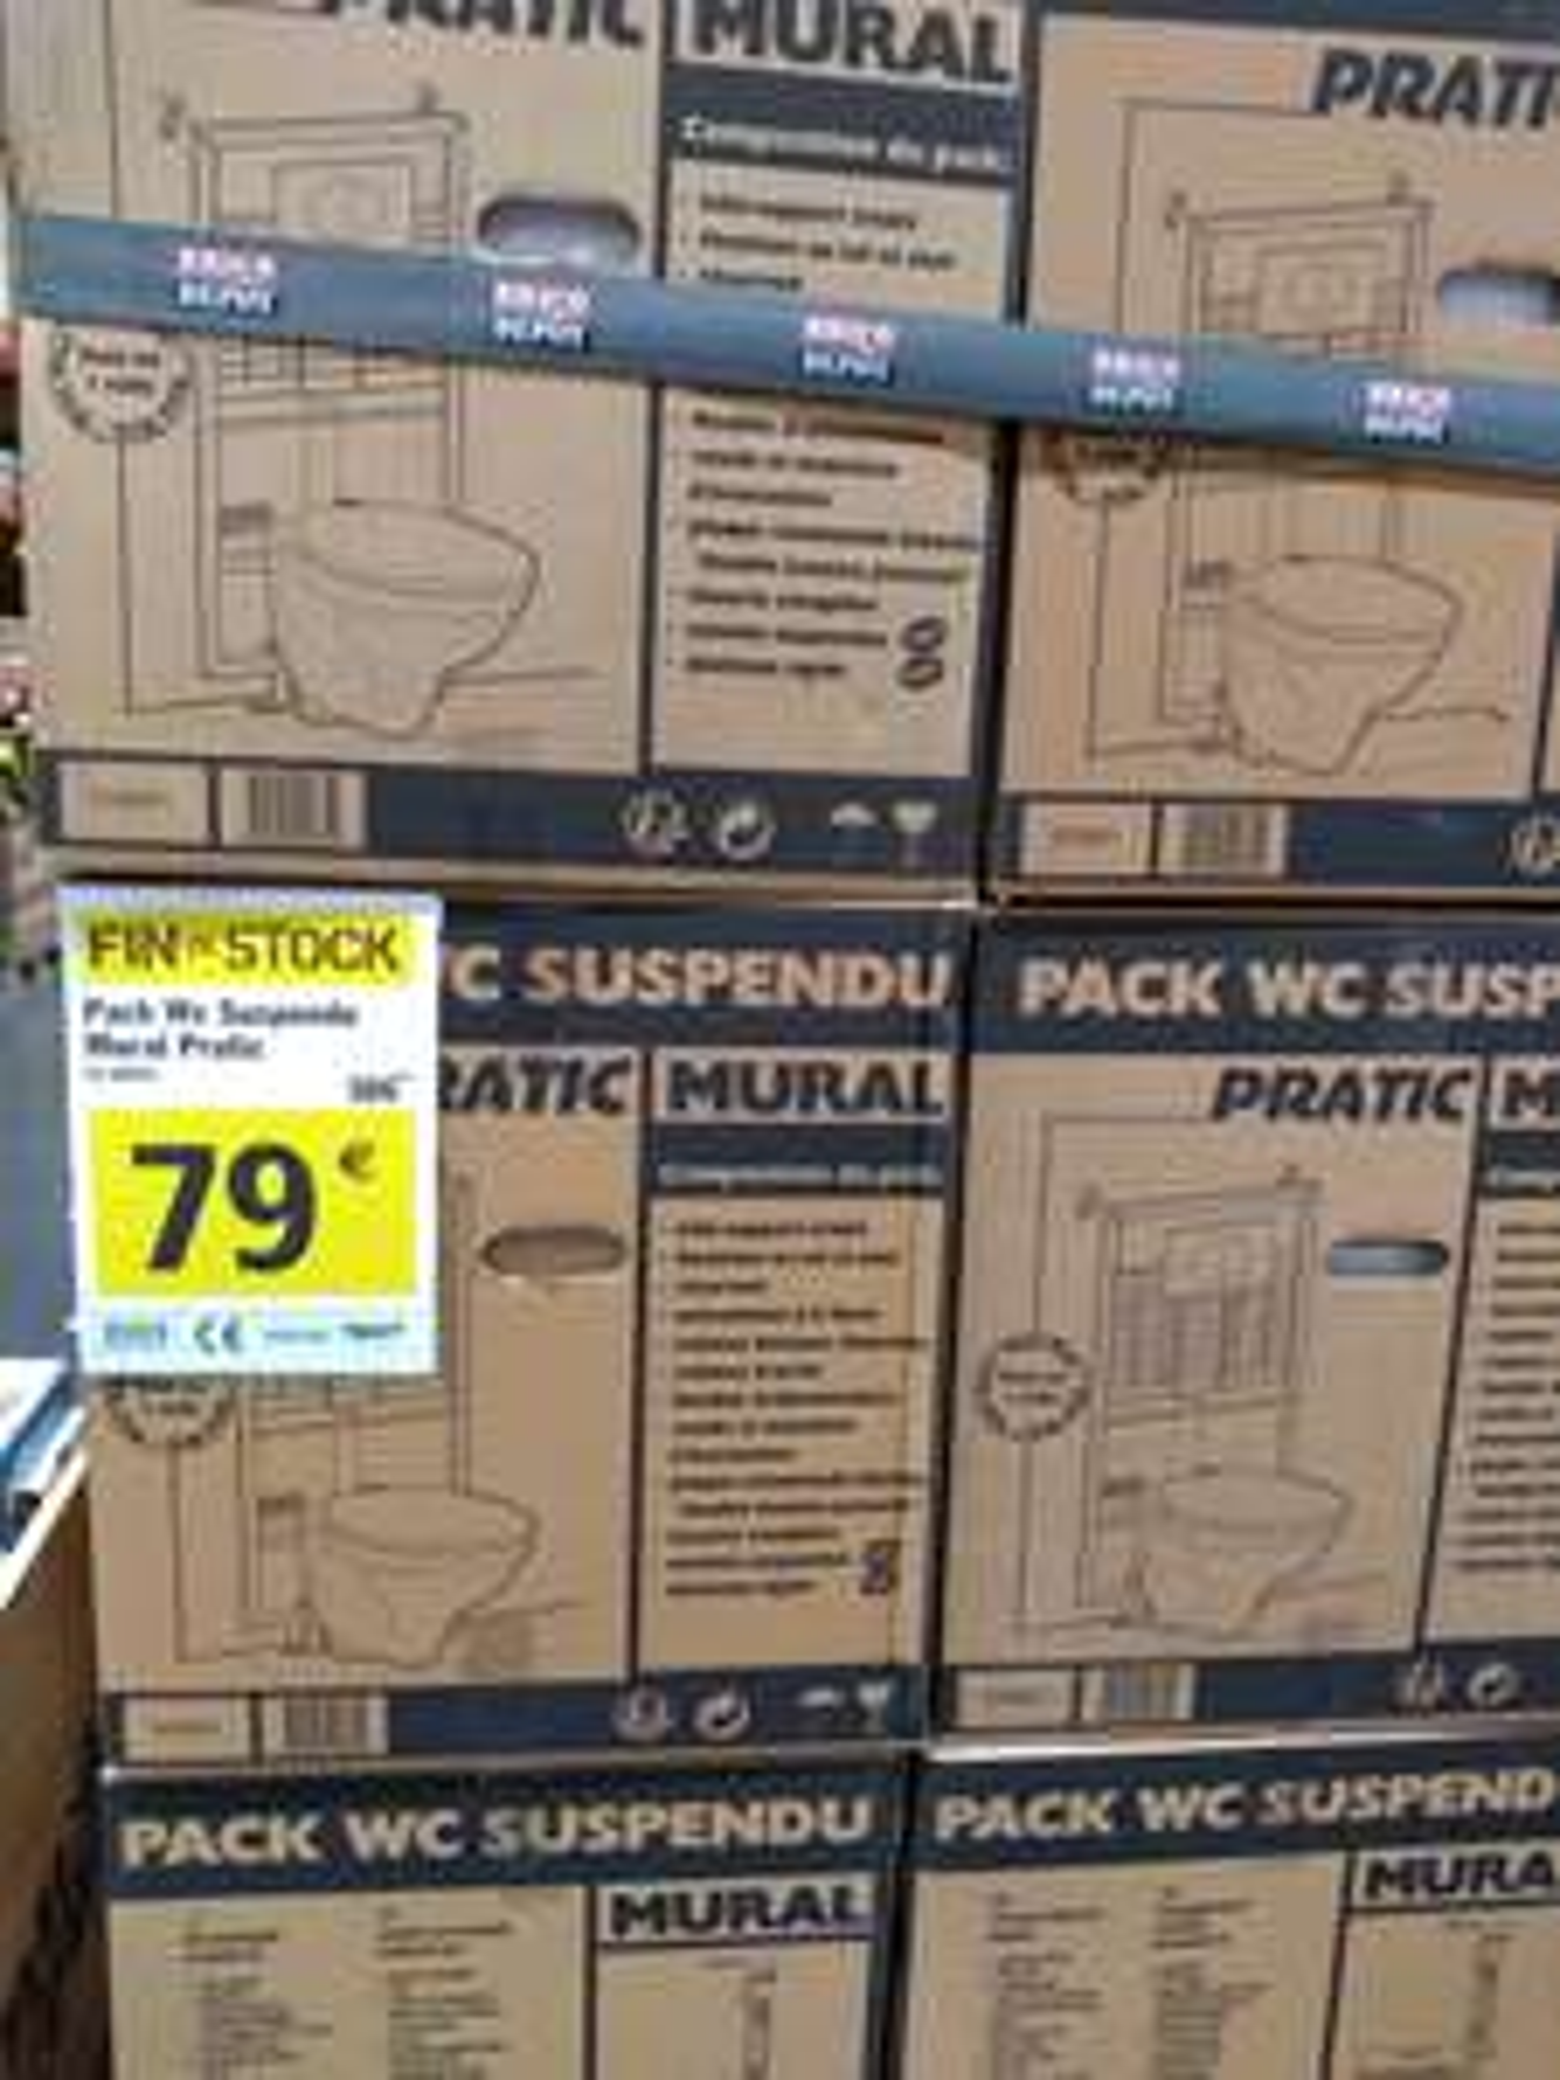 Pack WC Suspendu Pratic Mural - Pavie (32)